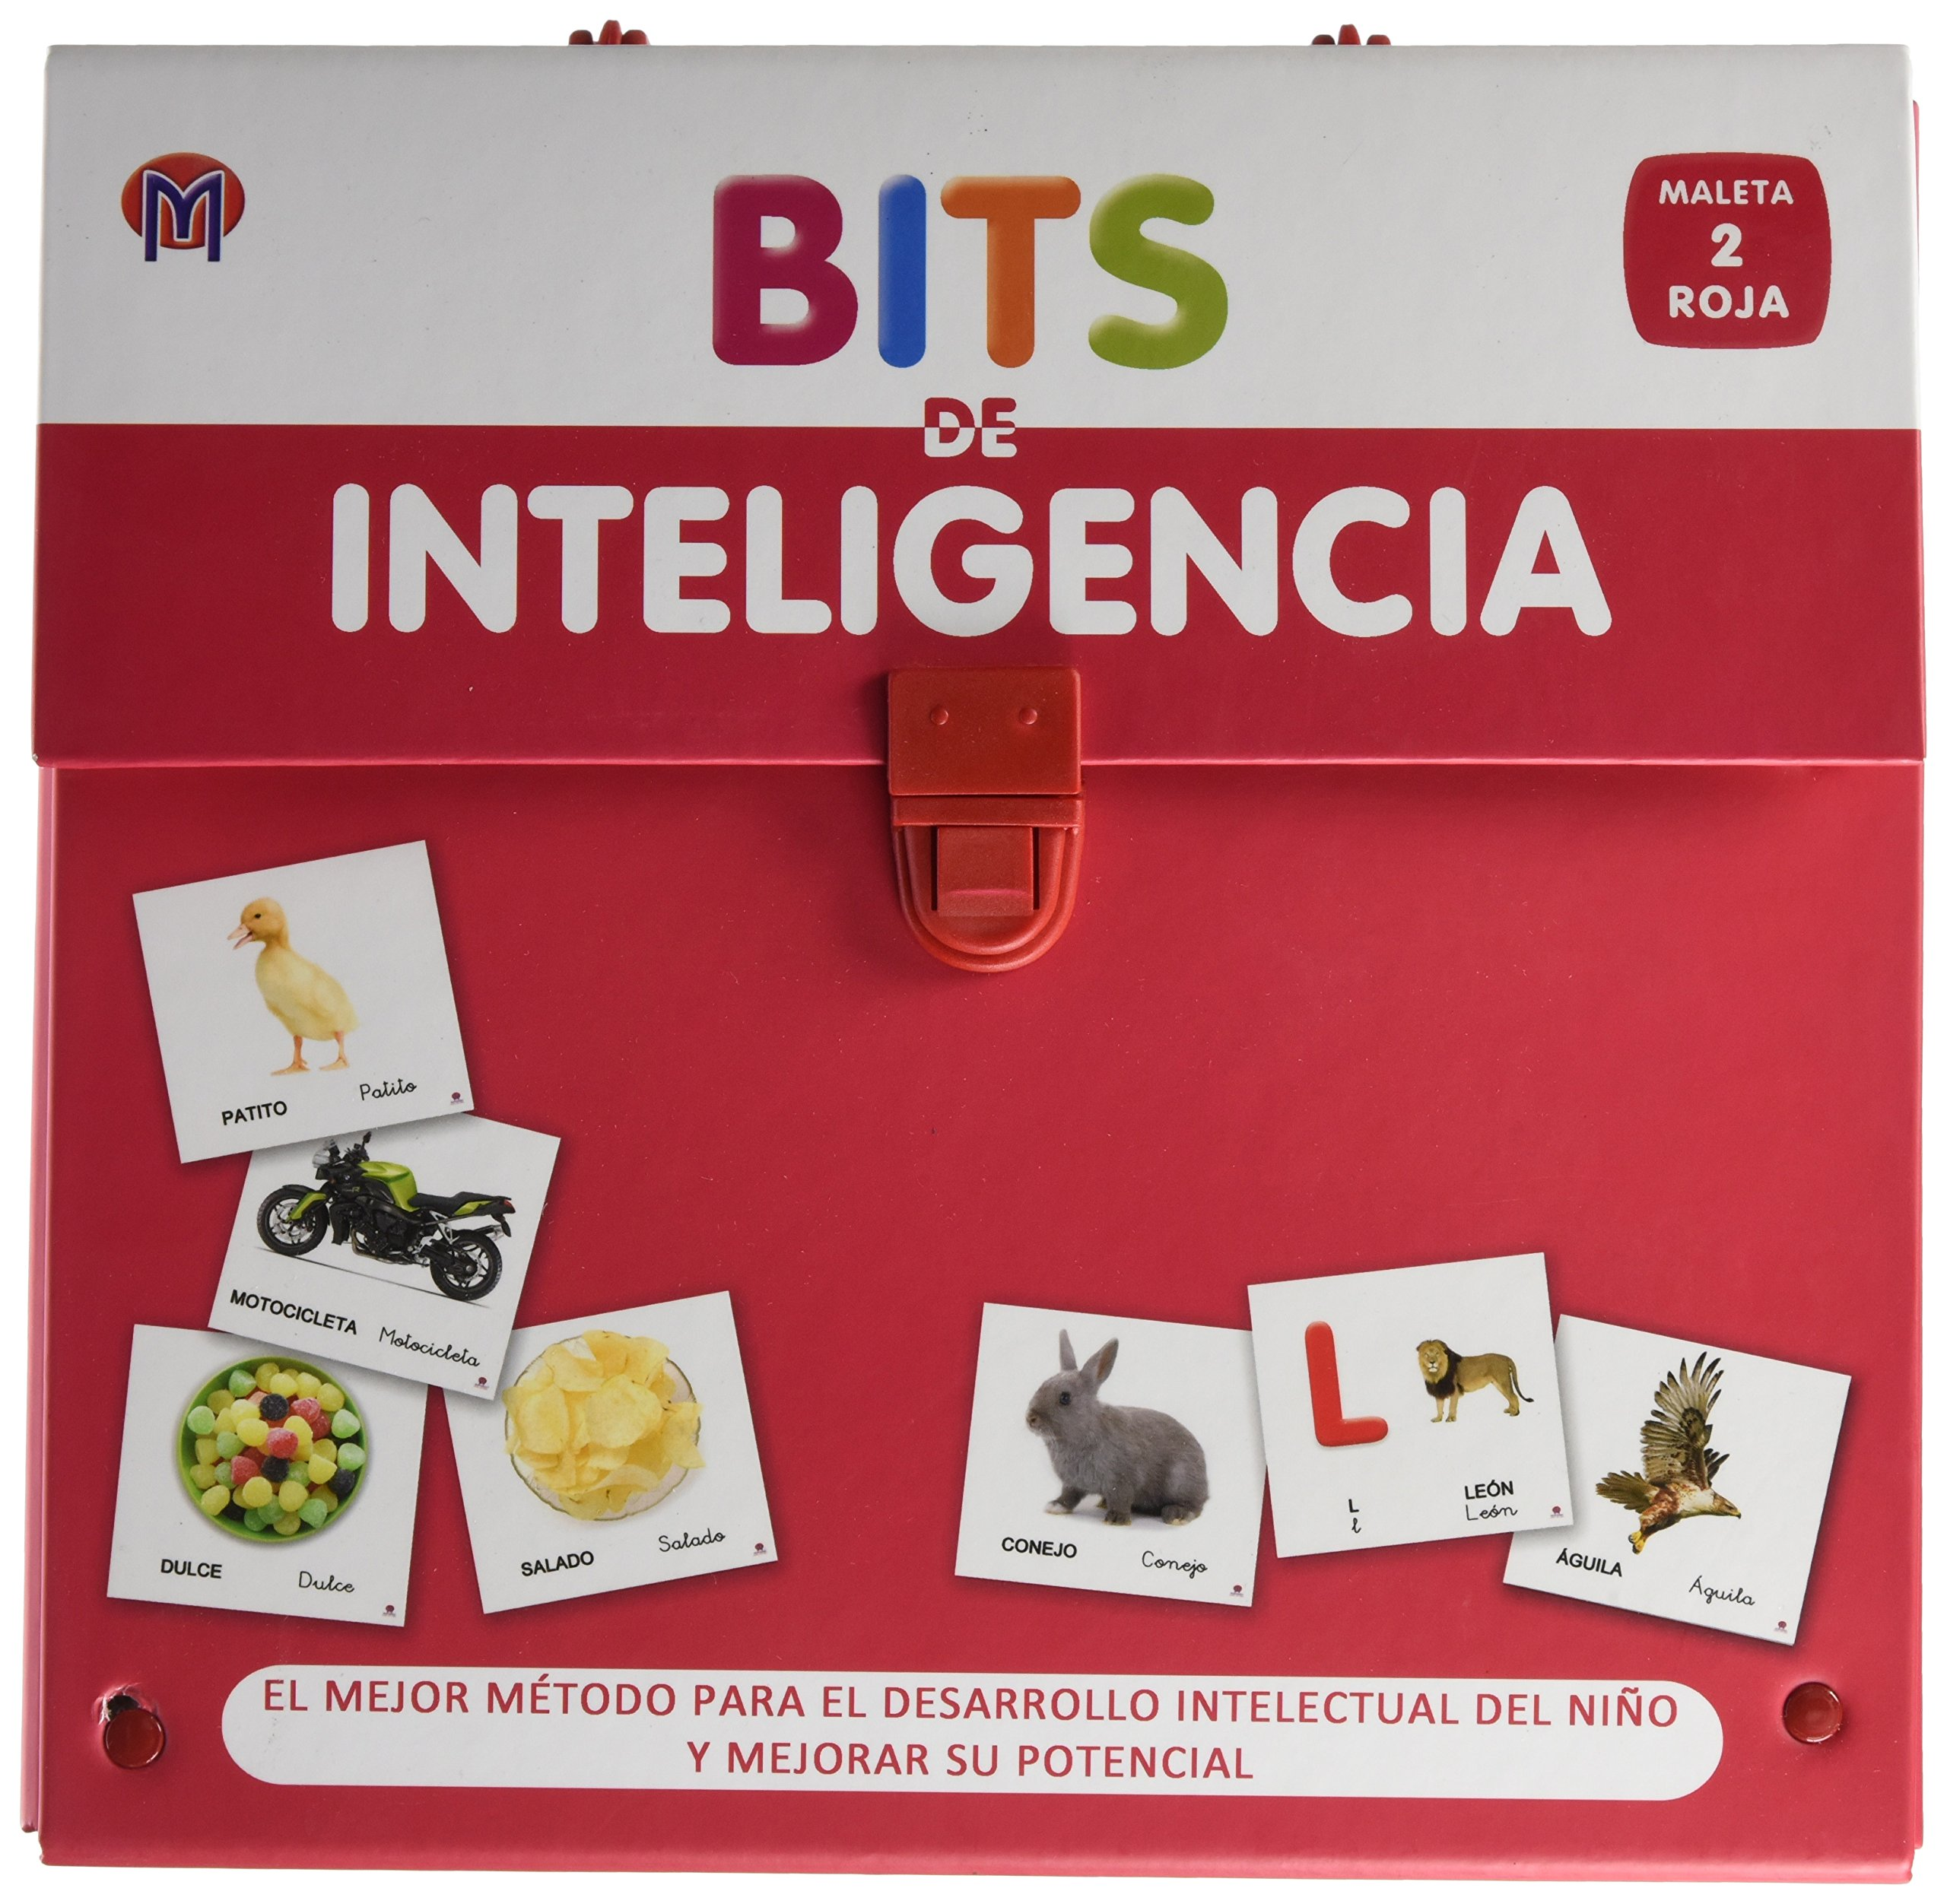 BITS DE INTELIGENCIA (MALETA 2 ROJA) (Spanish)